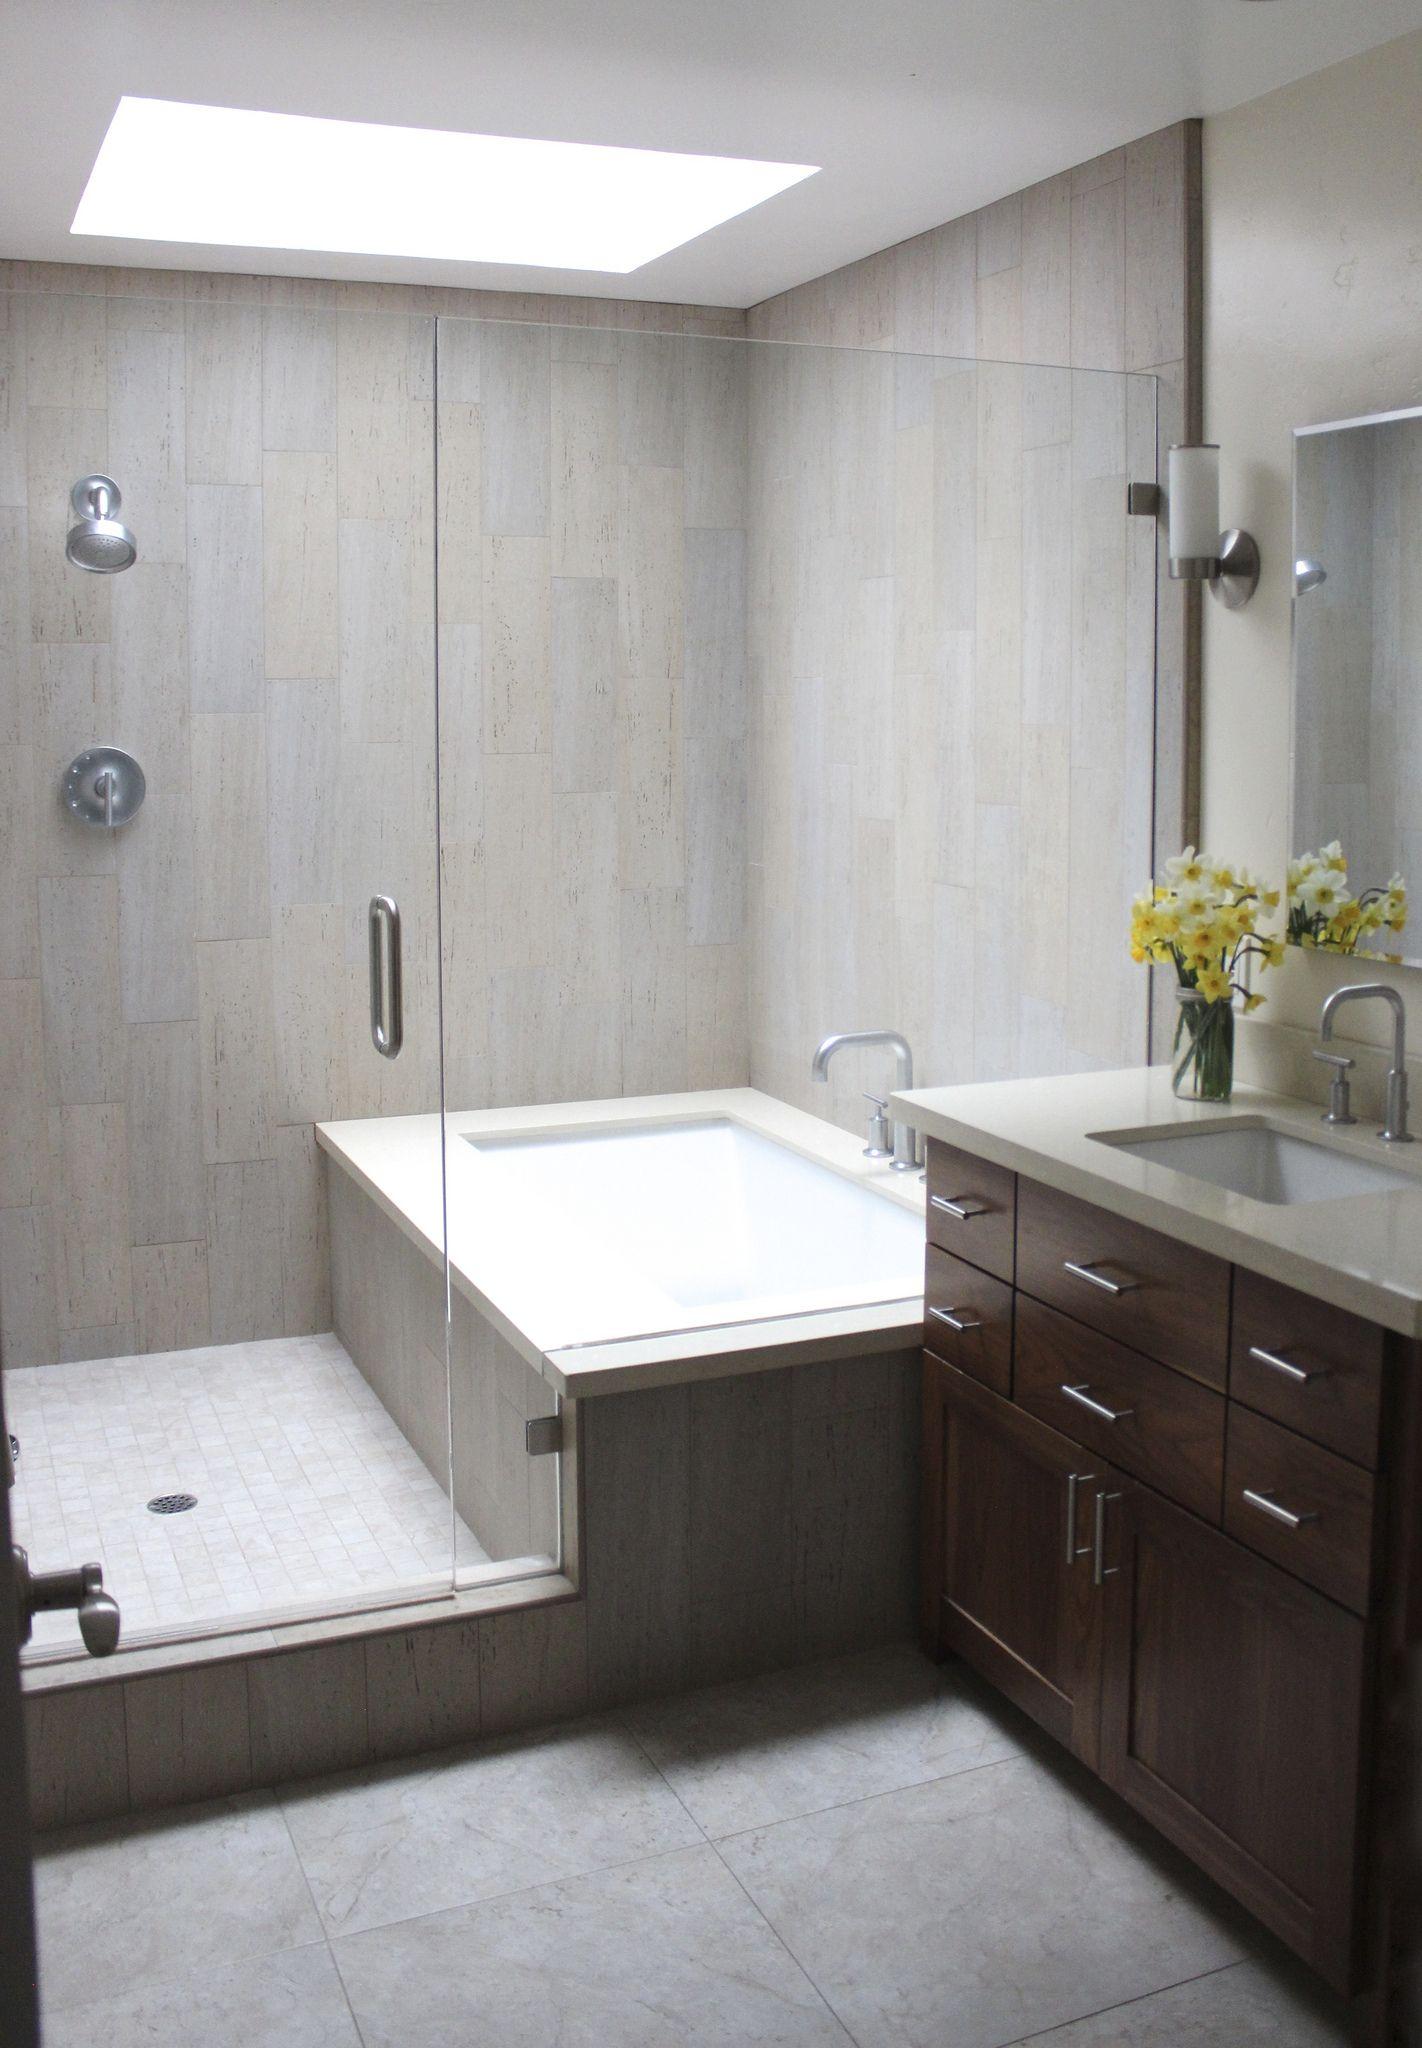 small corner bathtub shower combo. Tub shower combo great idea for a master bath  corner bathtub small bathroom Design Decoration